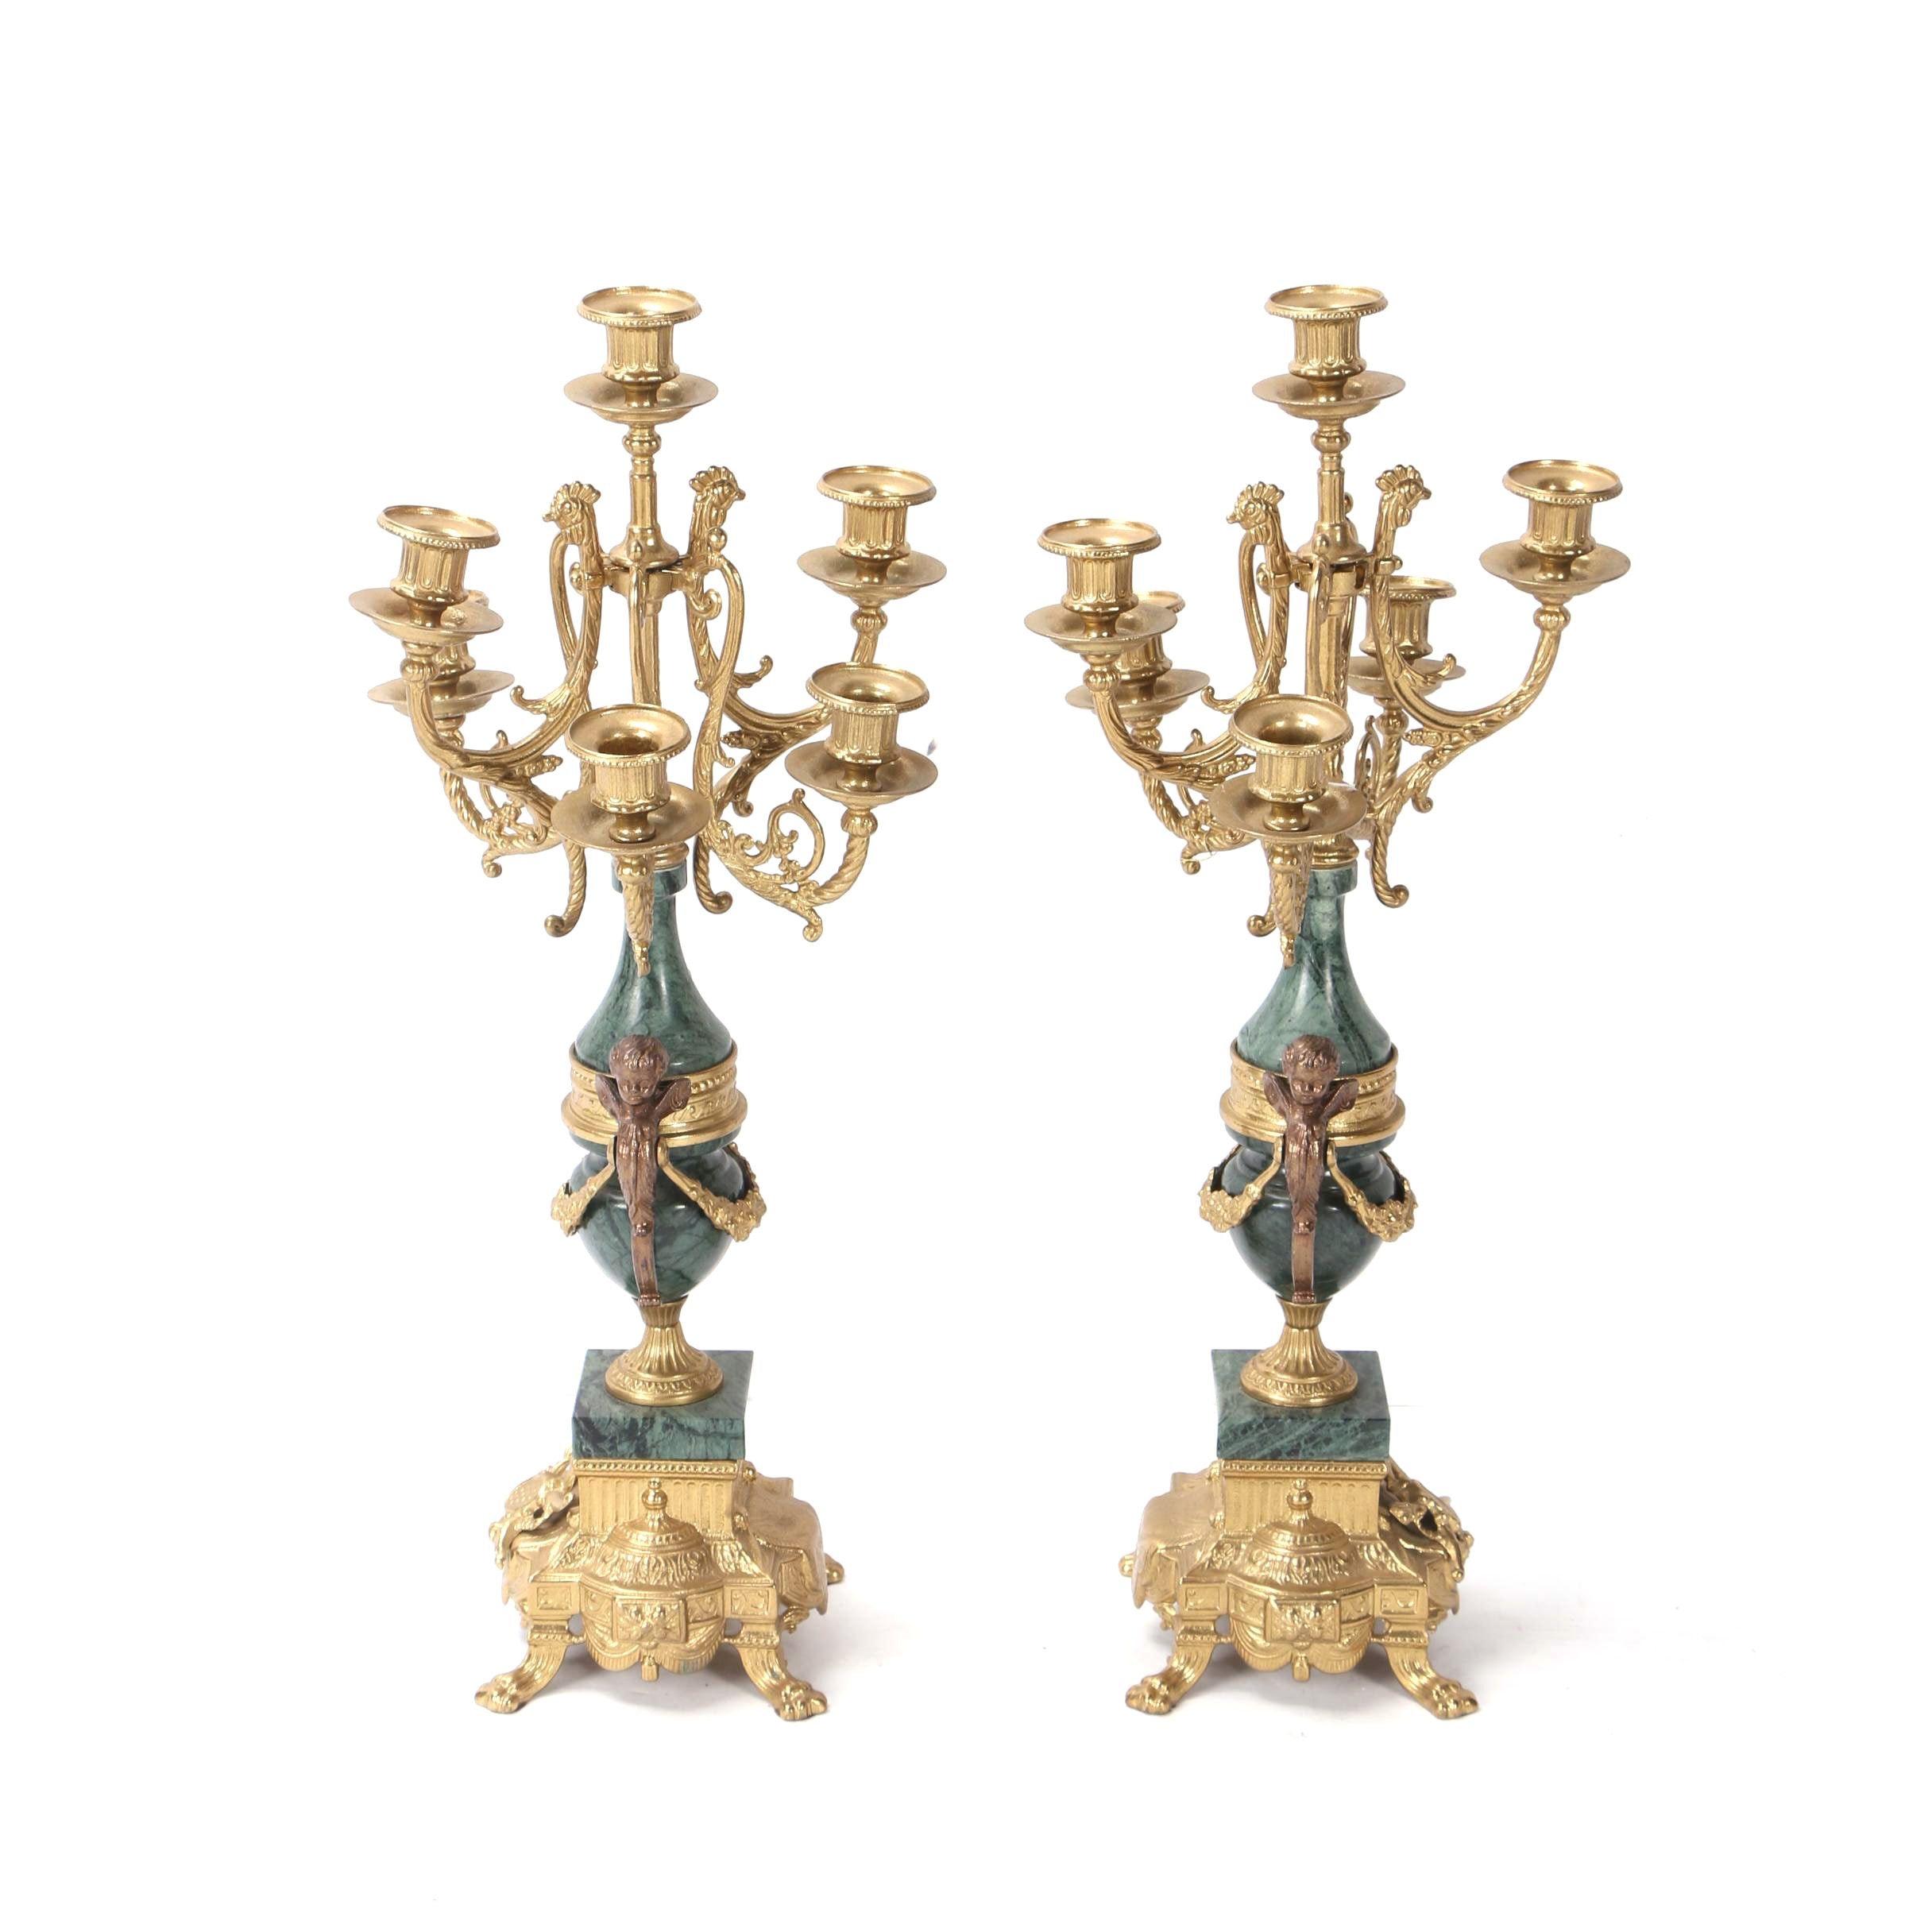 Vintage Italian Brevettato Brass and Green Marble Candelabrums